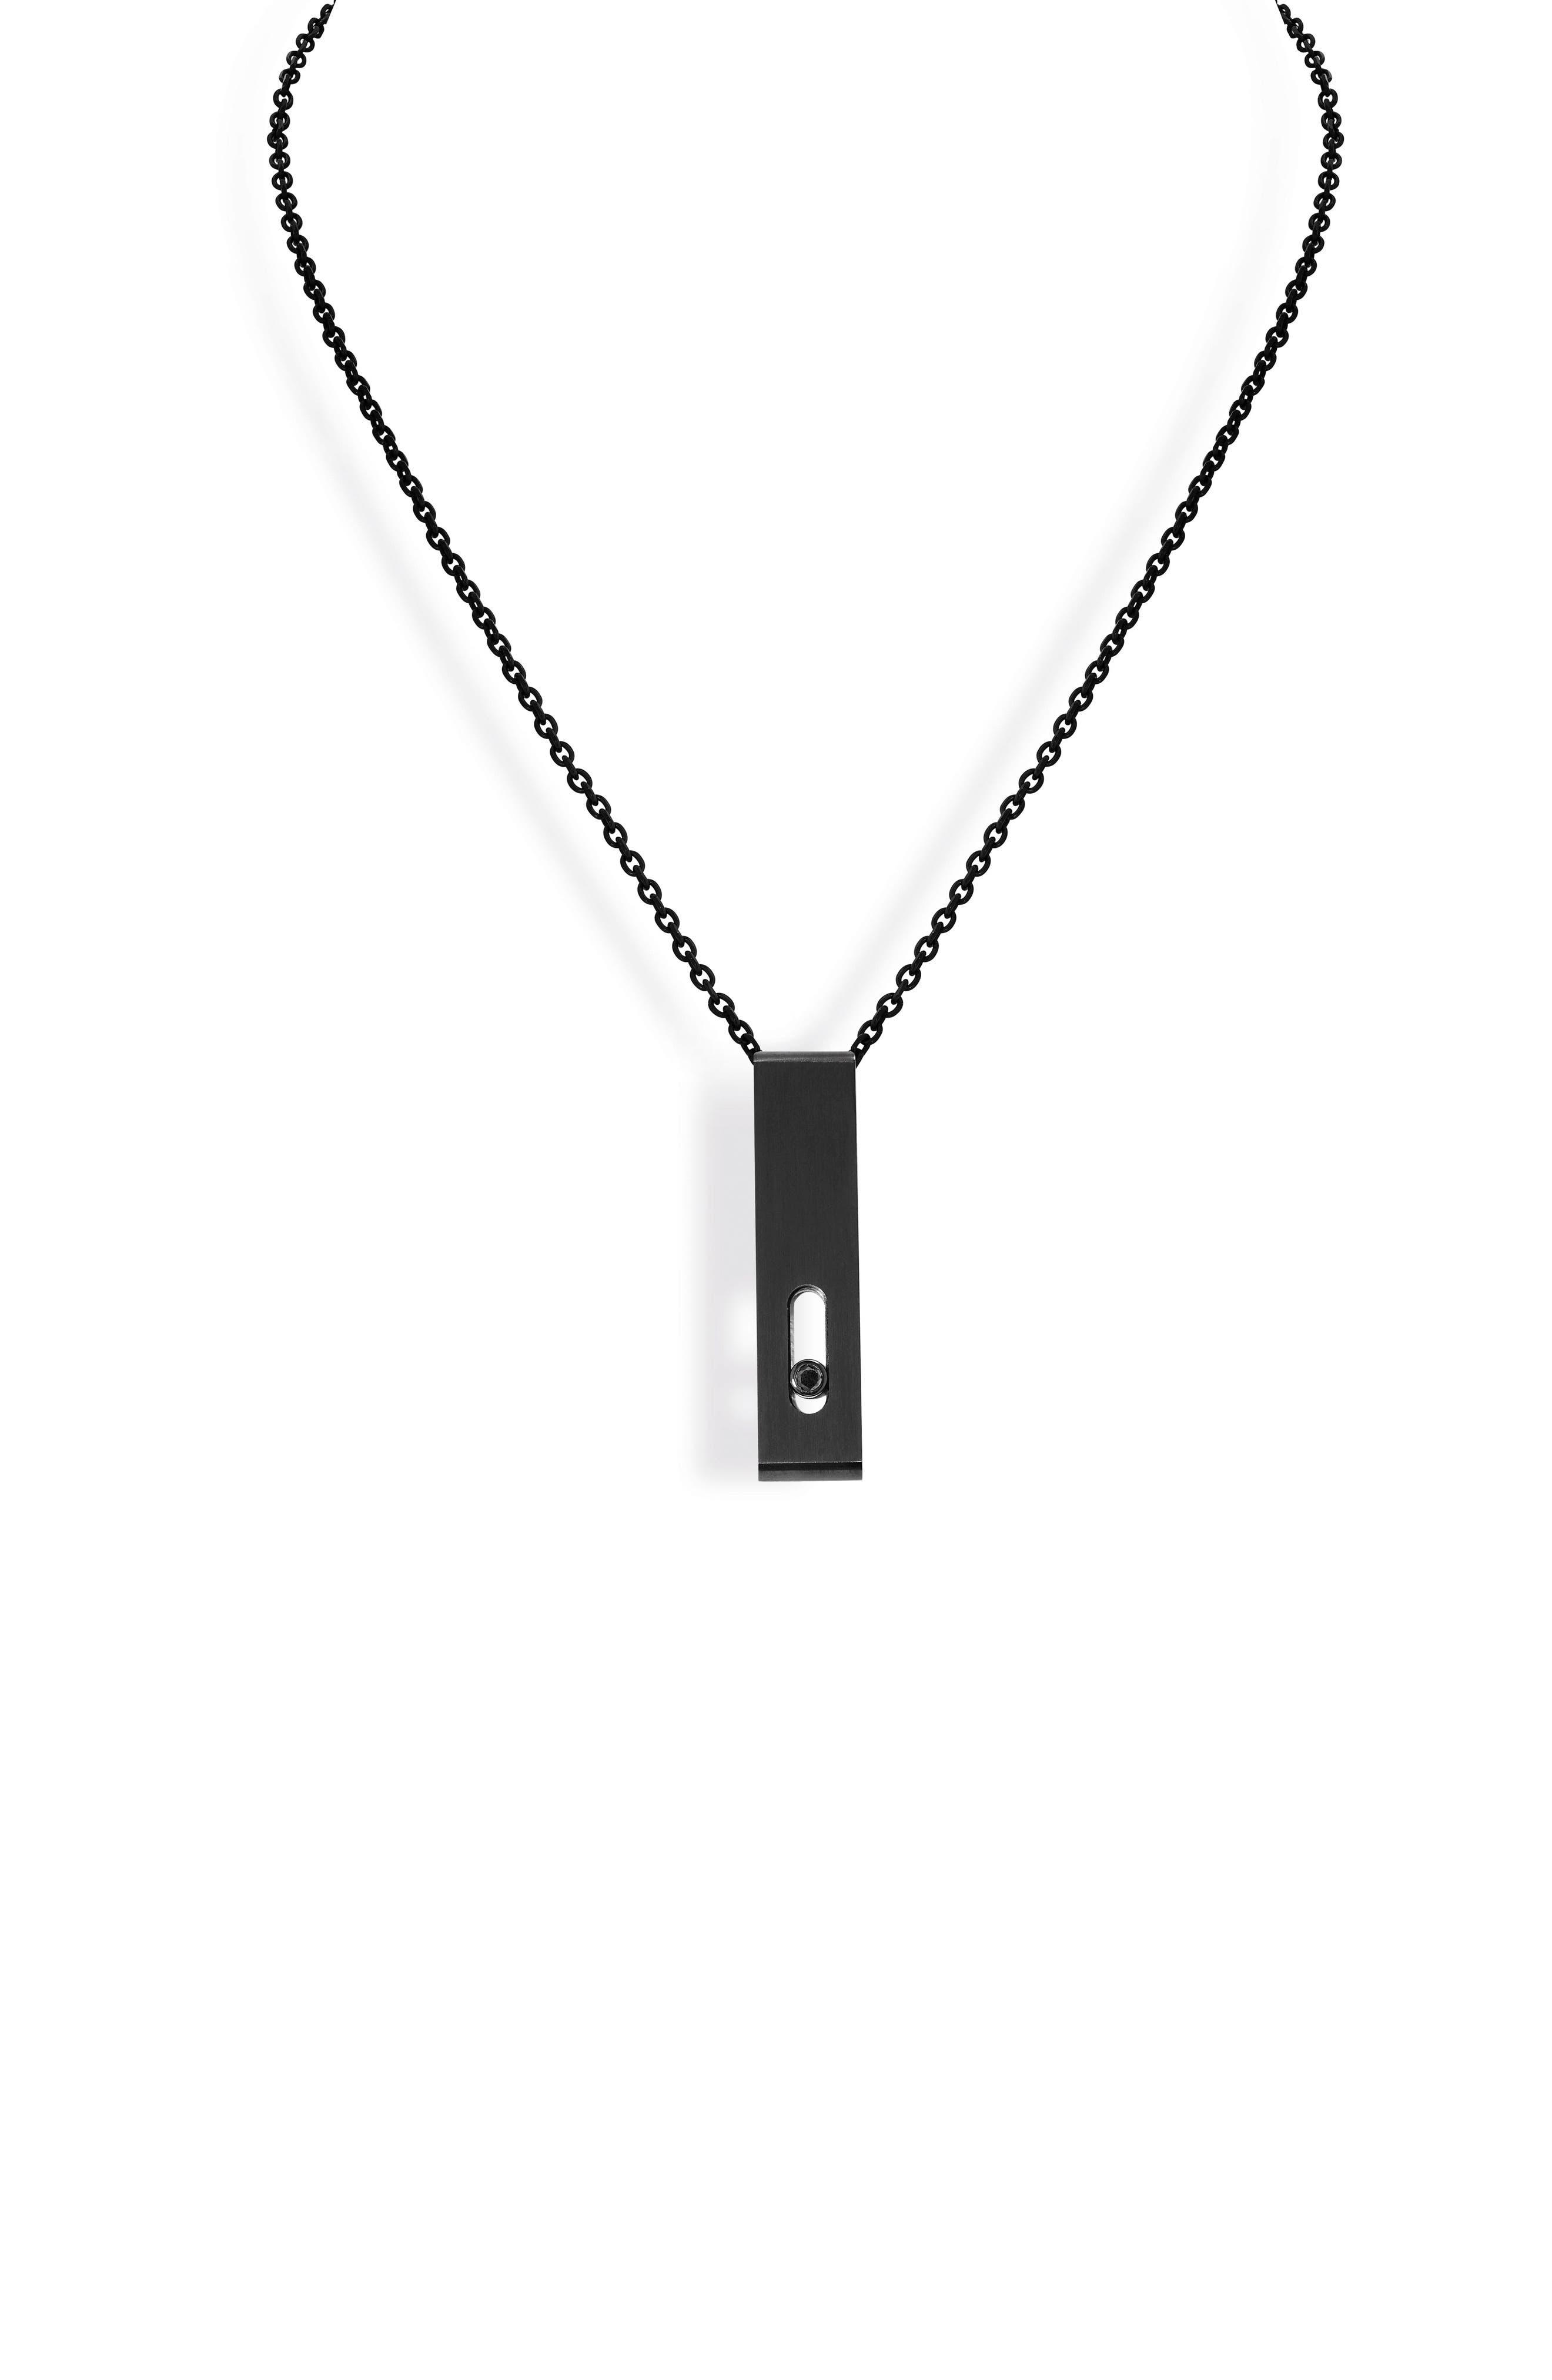 Titanium Move Diamond Pendant Necklace,                             Main thumbnail 1, color,                             TITANIUM